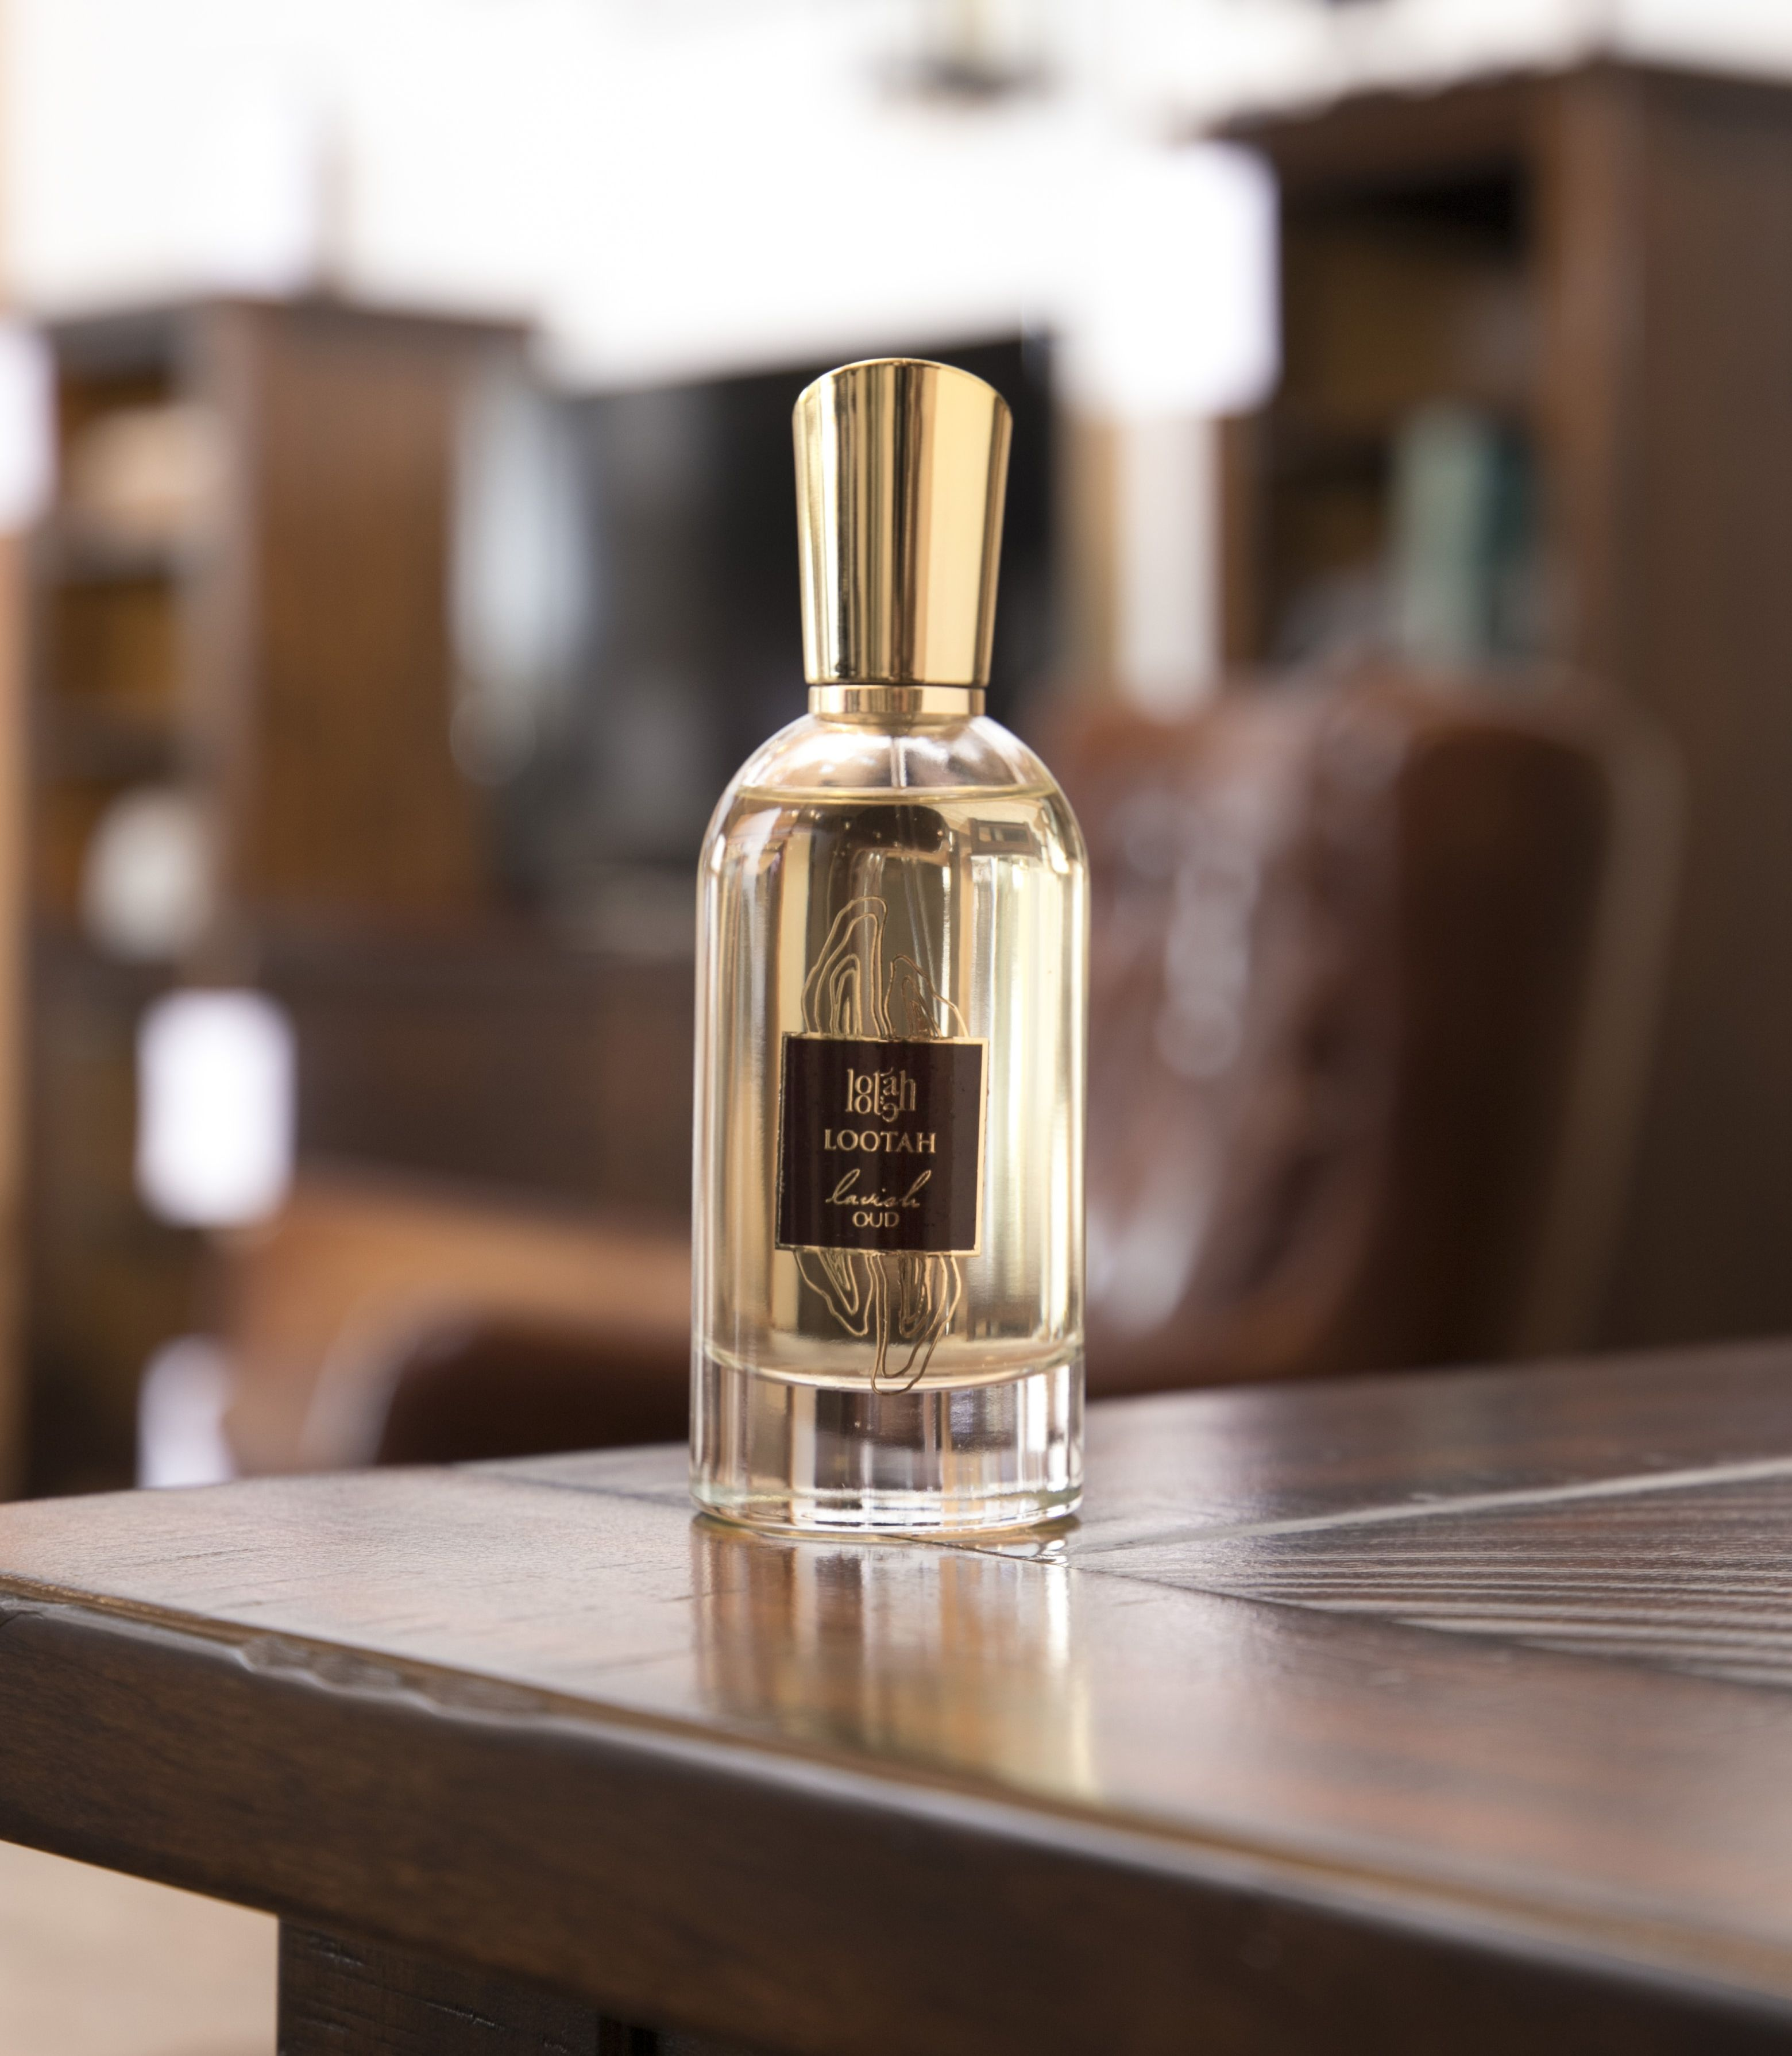 شخصيتك ذات كاريزما قوية أكملها مع عطر لافيش Do You Have A Charismatic Personality Complete It With Lavish Perfu Perfume Perfume Bottles Fragrance